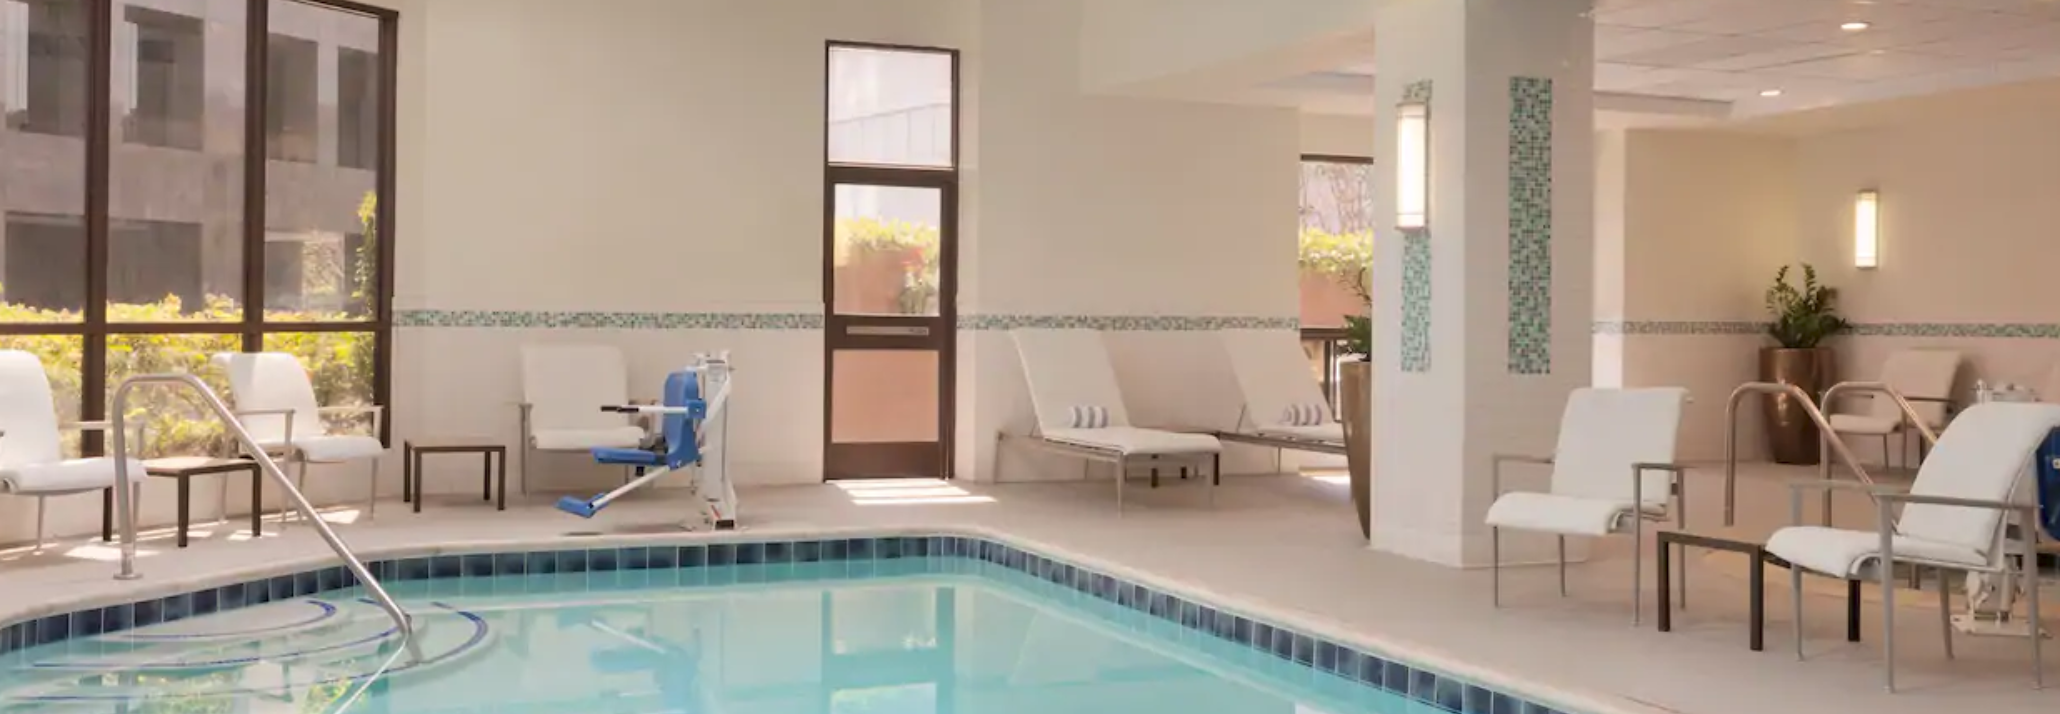 https://www.hotelsbyday.com/_data/default-hotel_image/4/20197/screenshot-2020-08-08-at-10-27-31-pm.png